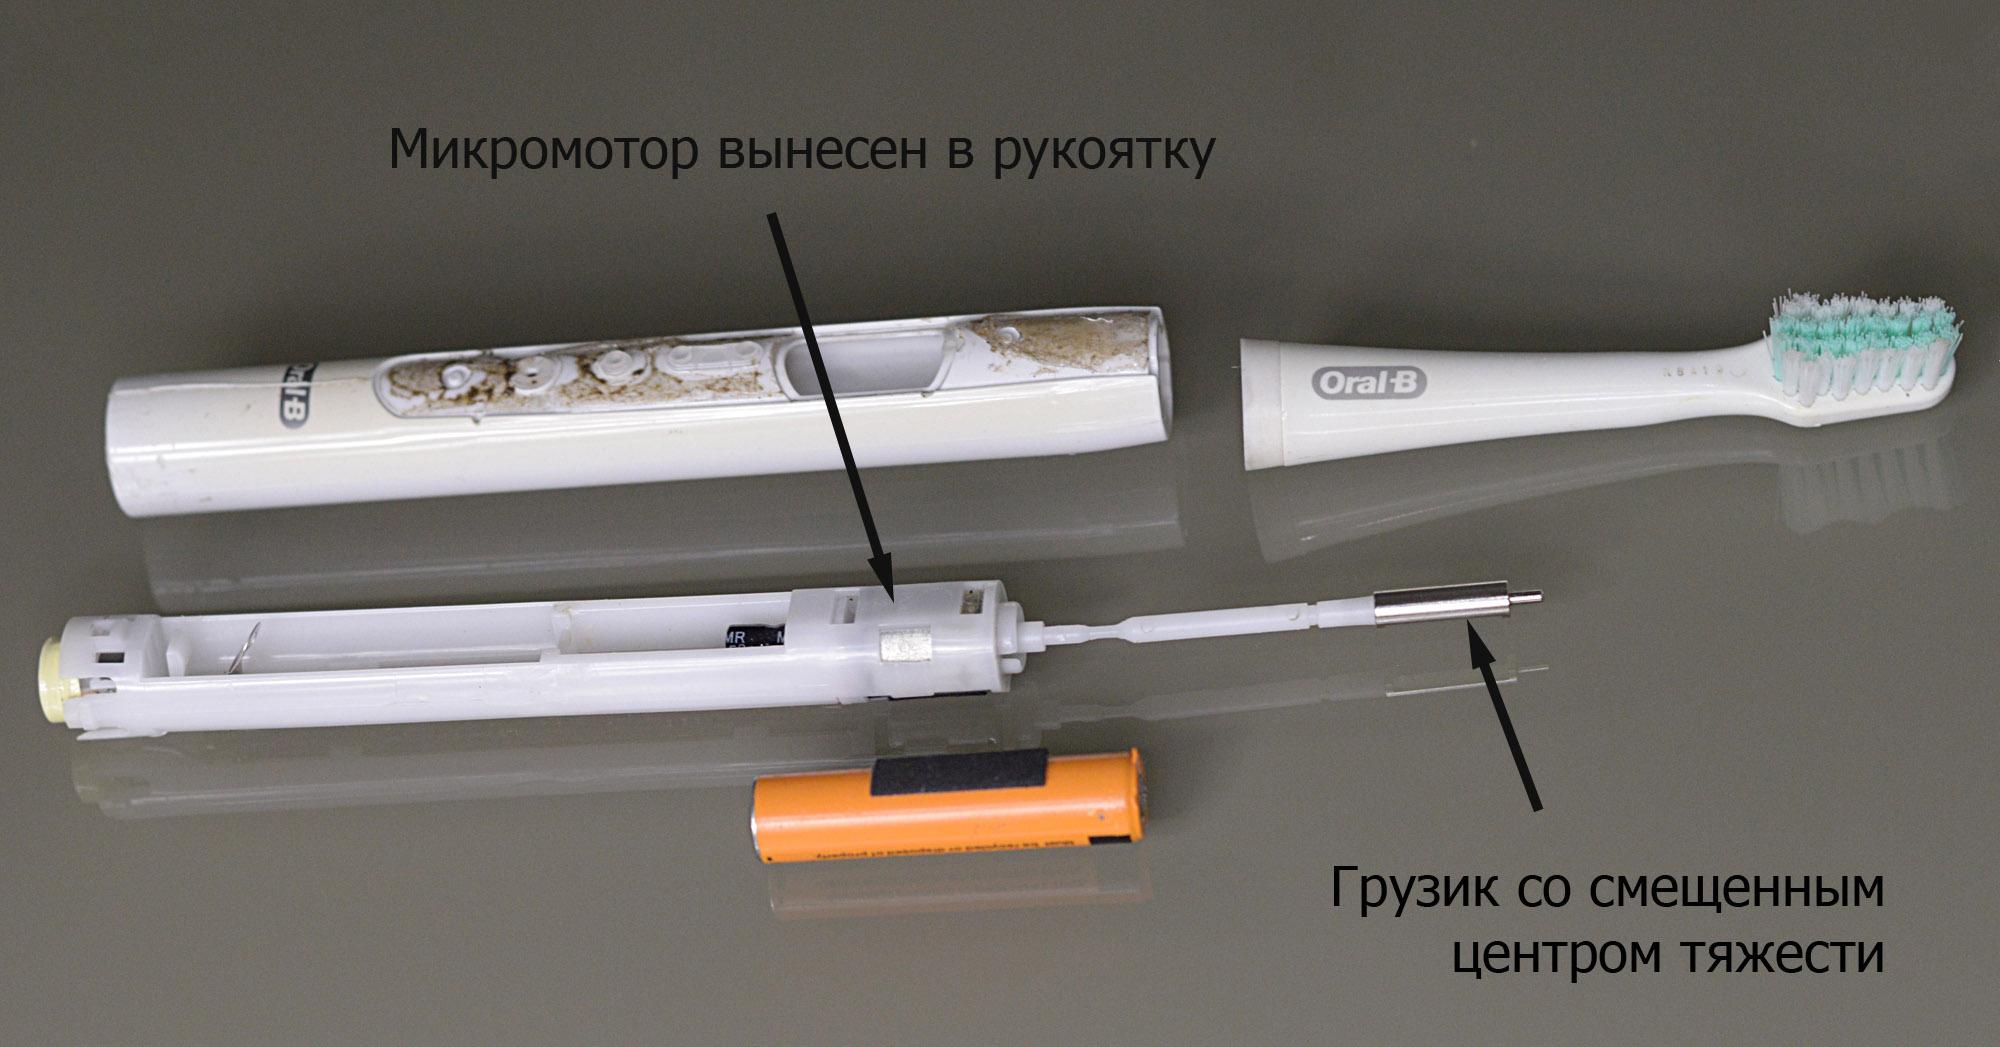 Oral-B Pulsonic в разобранном виде